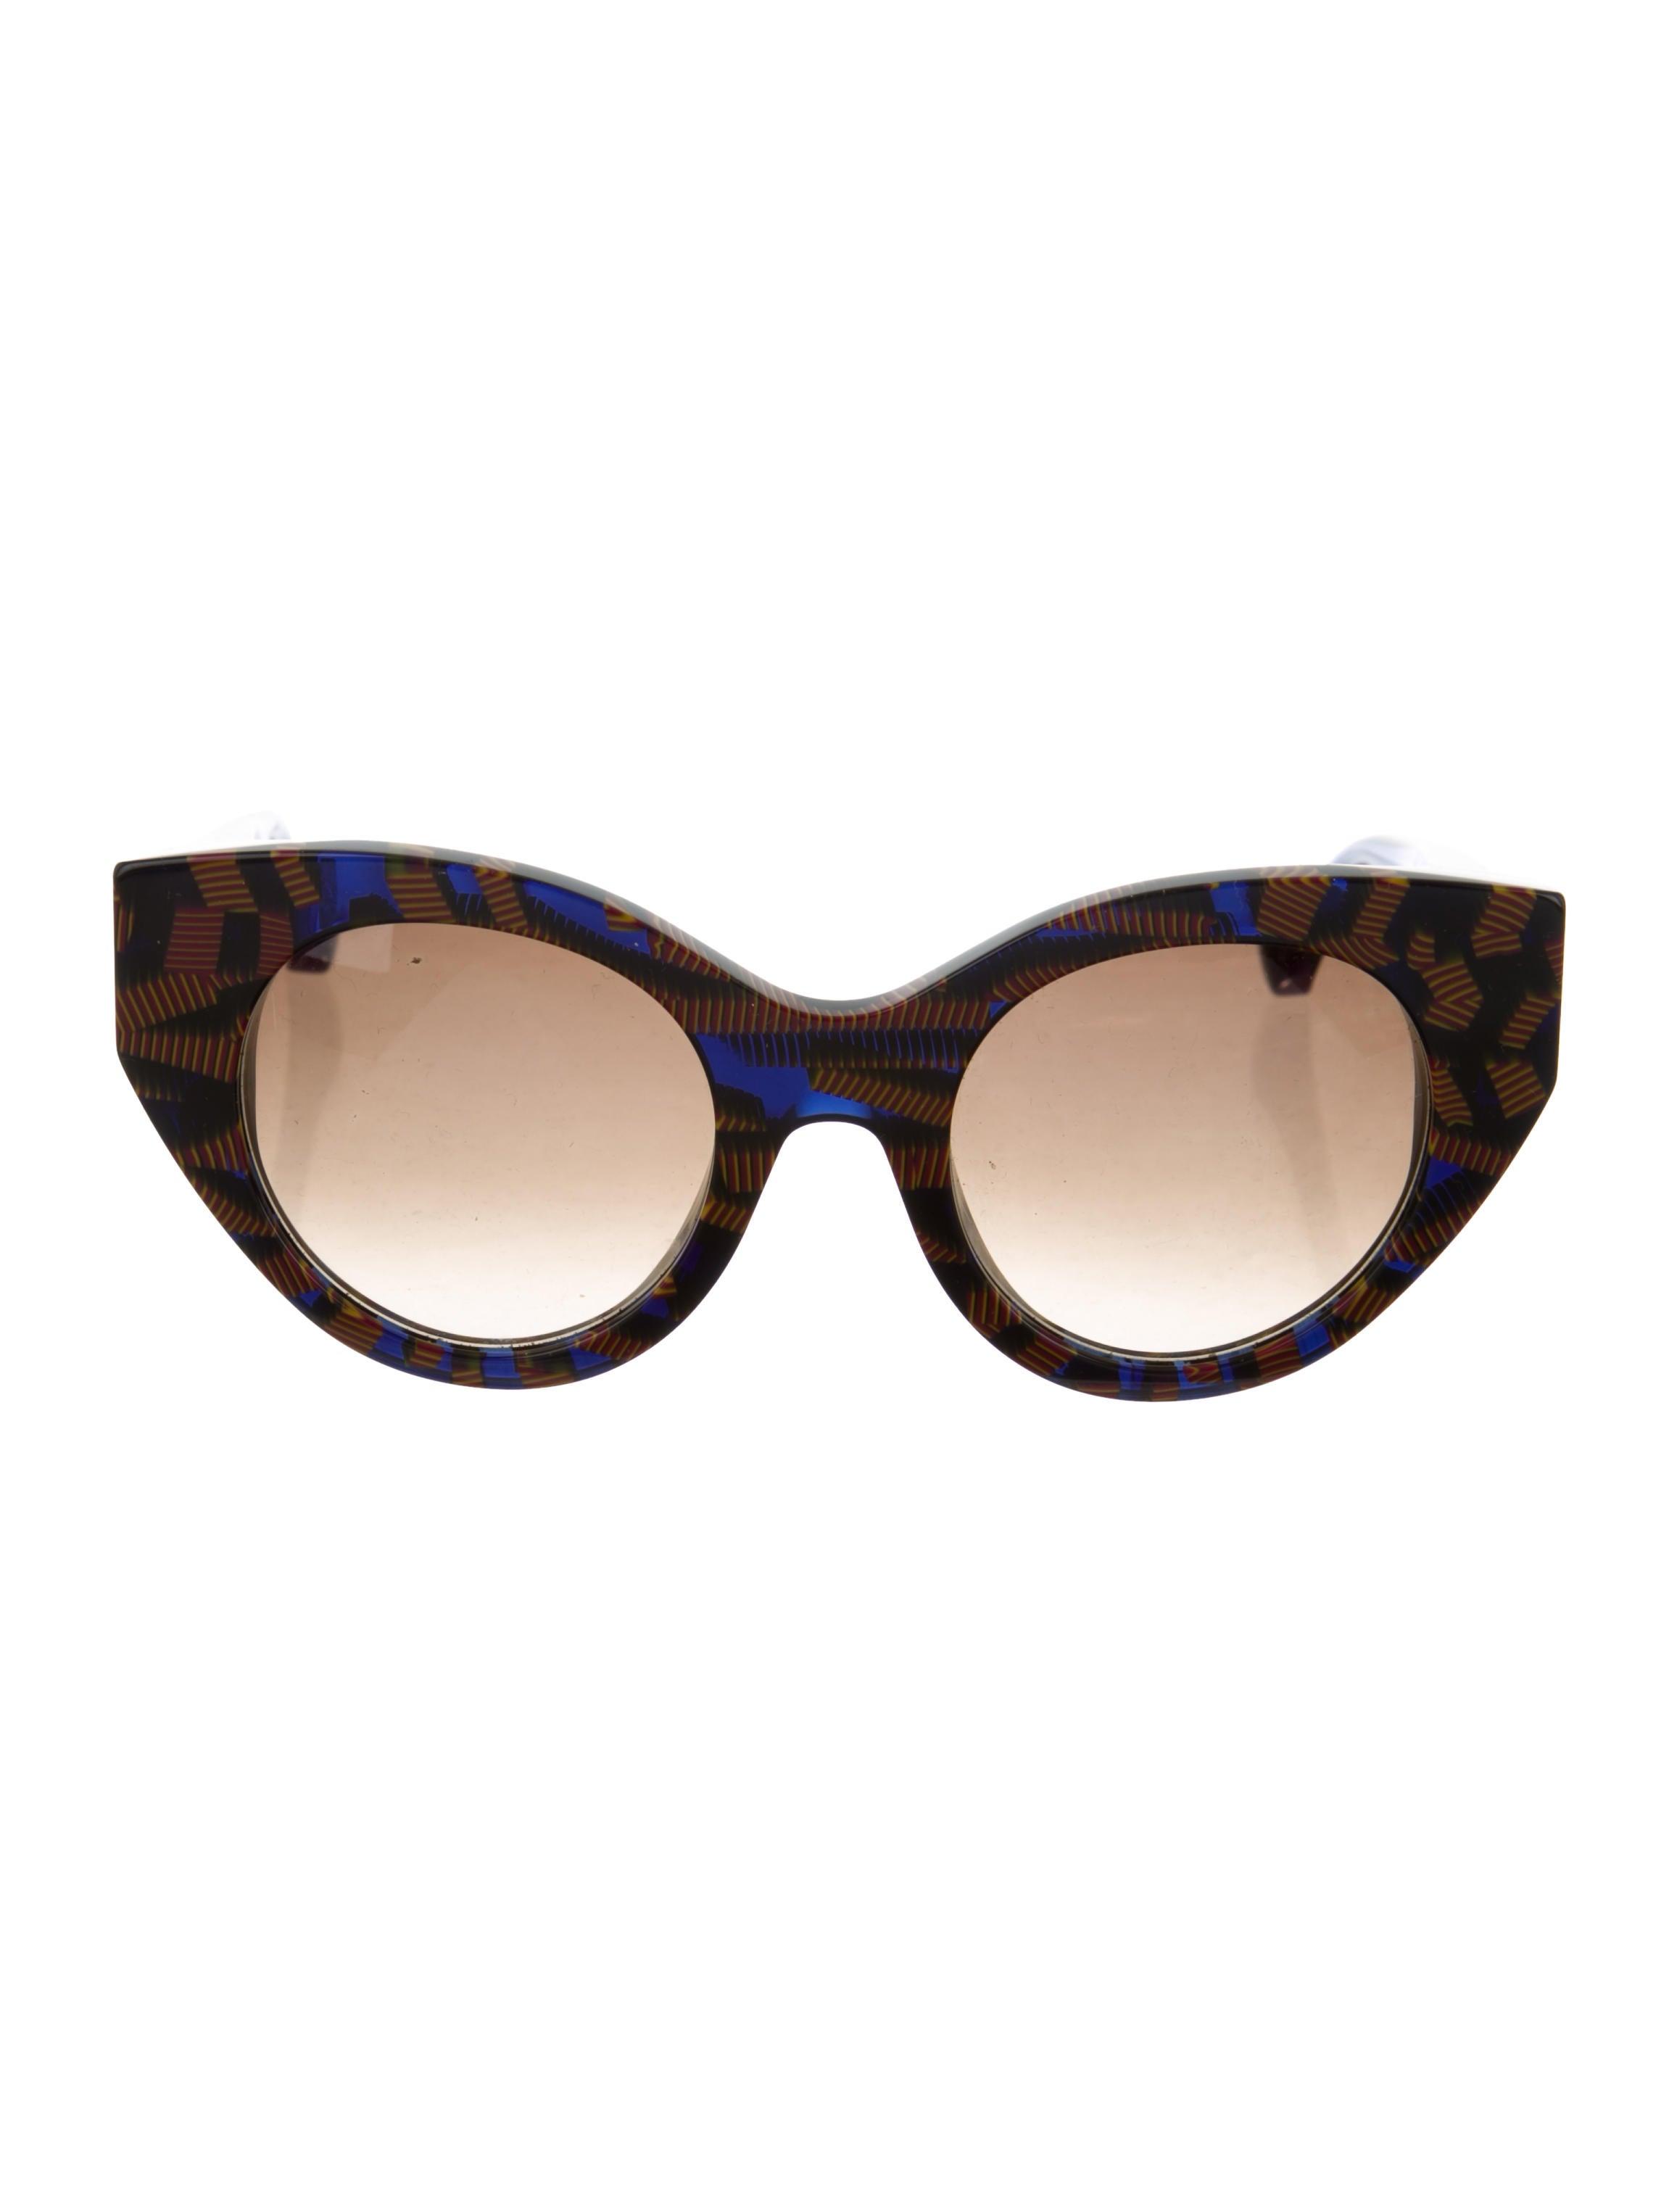 2a727bff1d374 Fendi Fanny Cat-Eye Sunglasses - Accessories - FEN80828